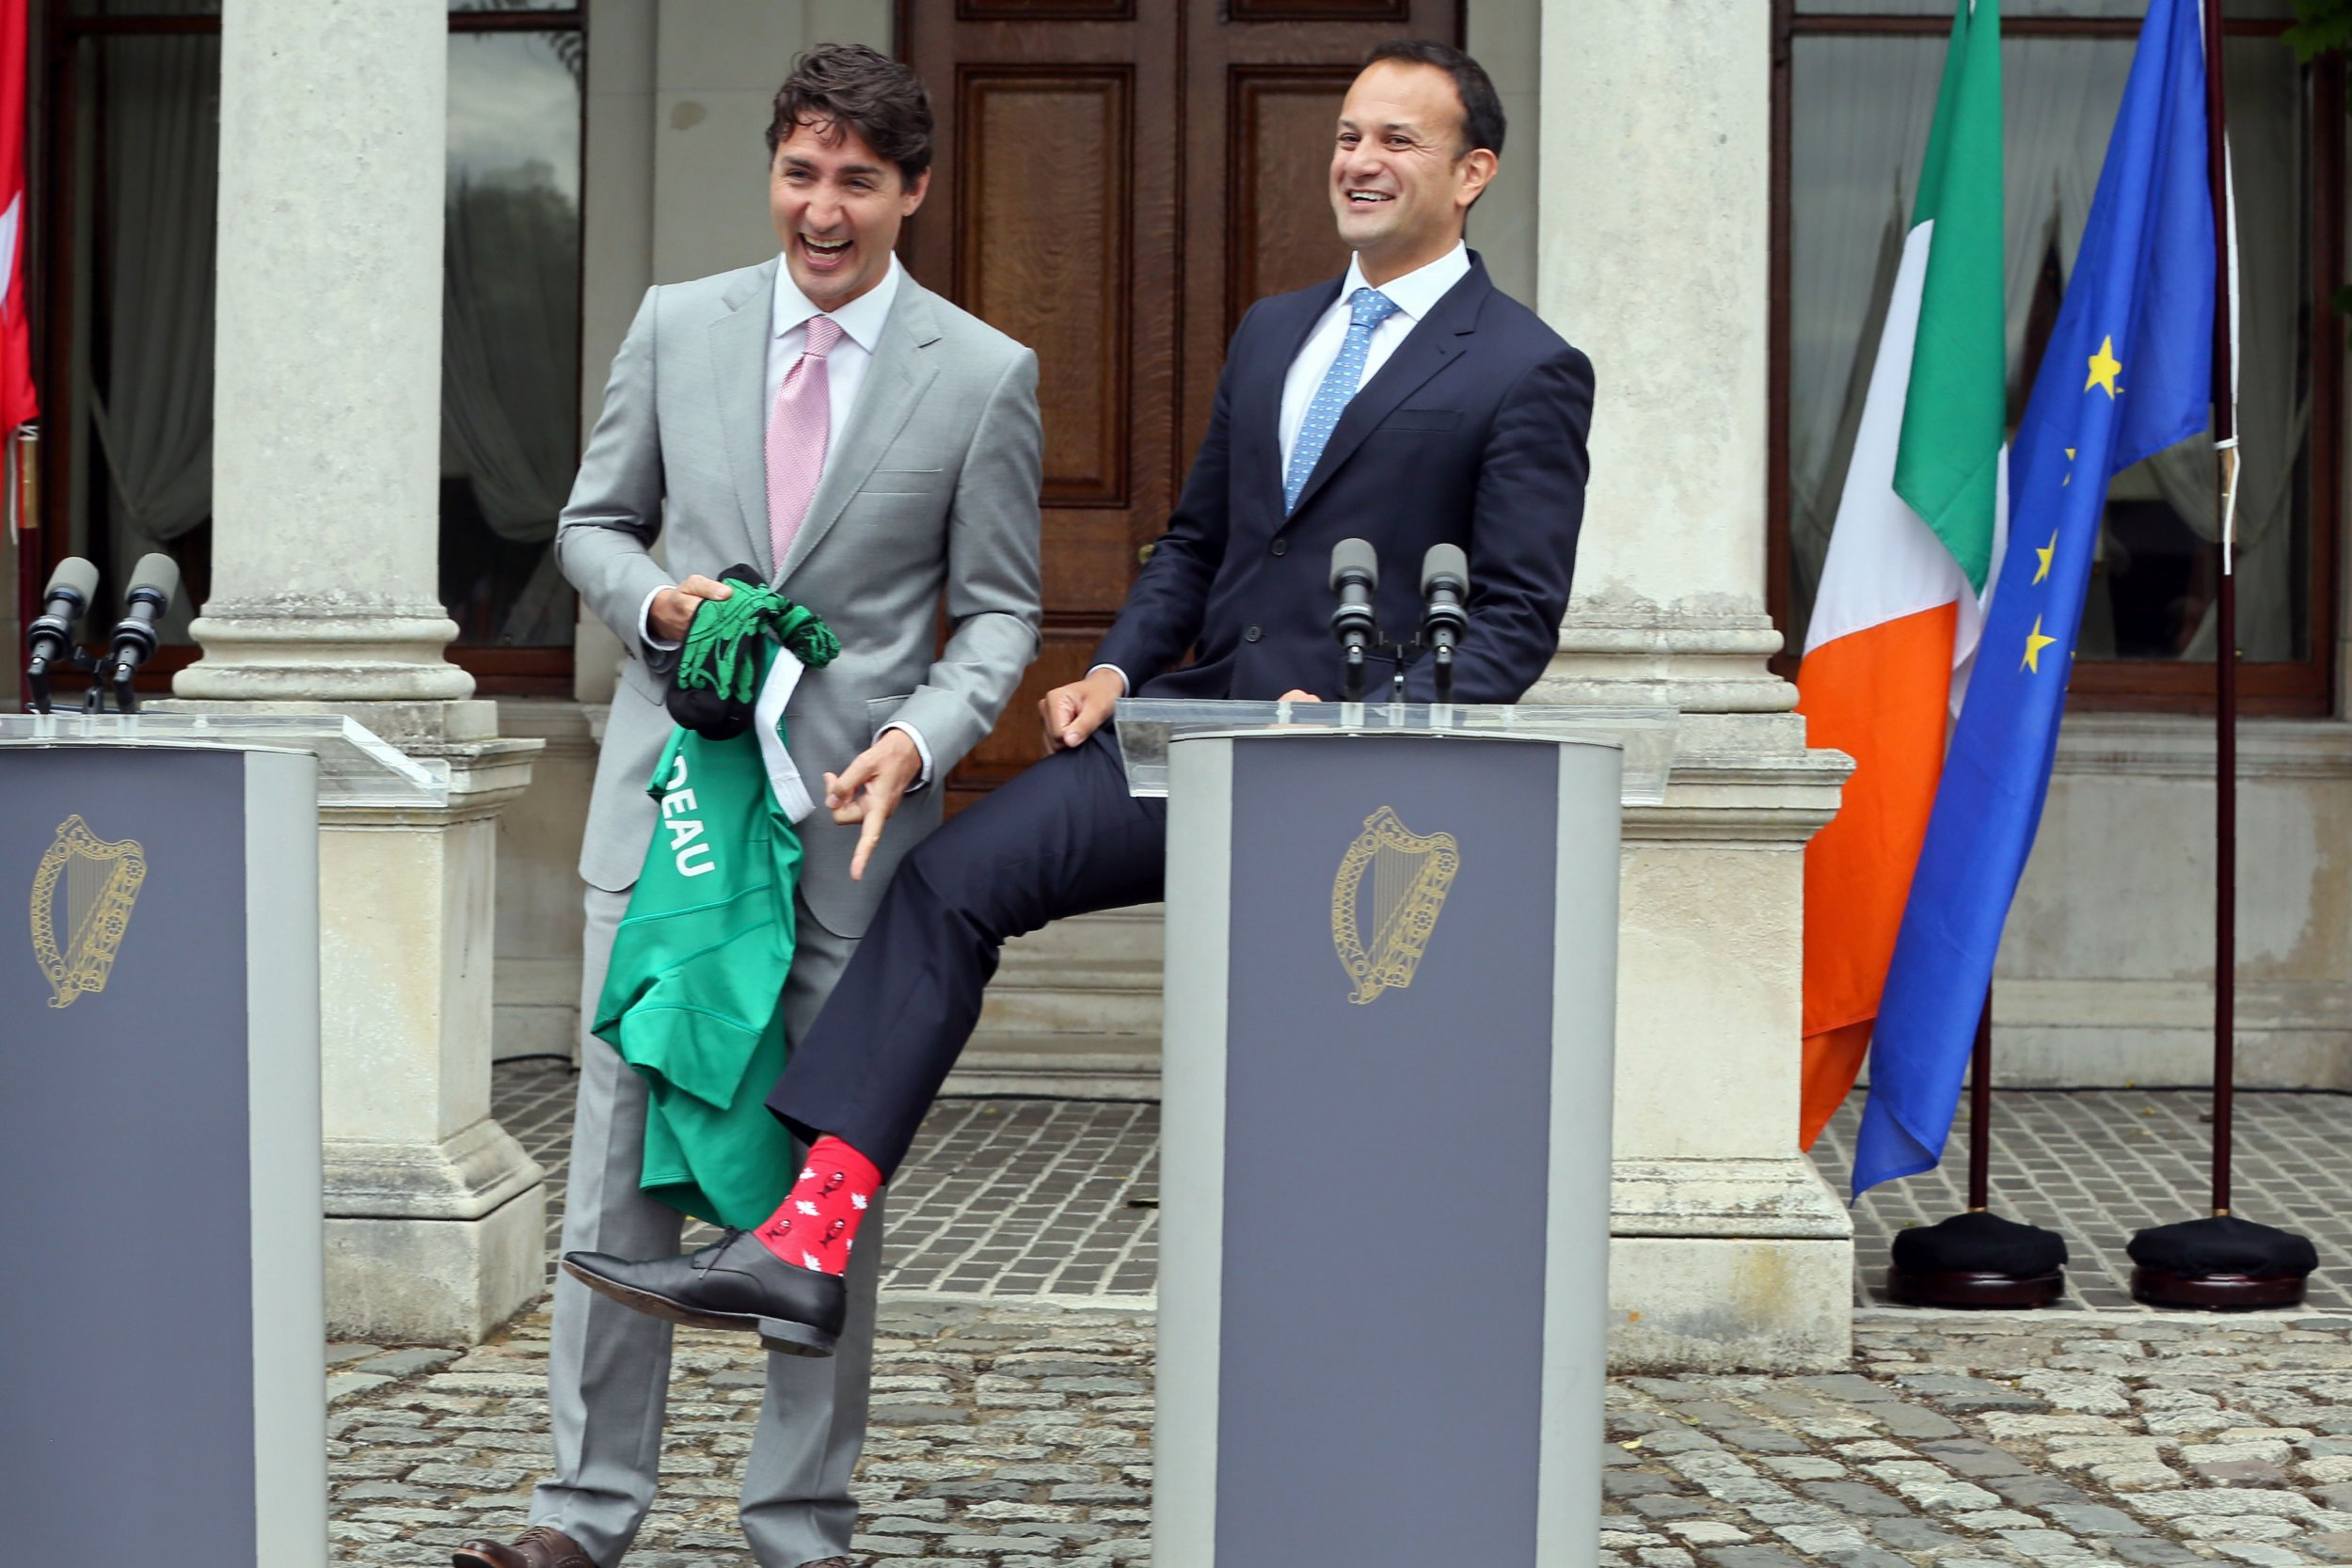 Trudeau in Ireland